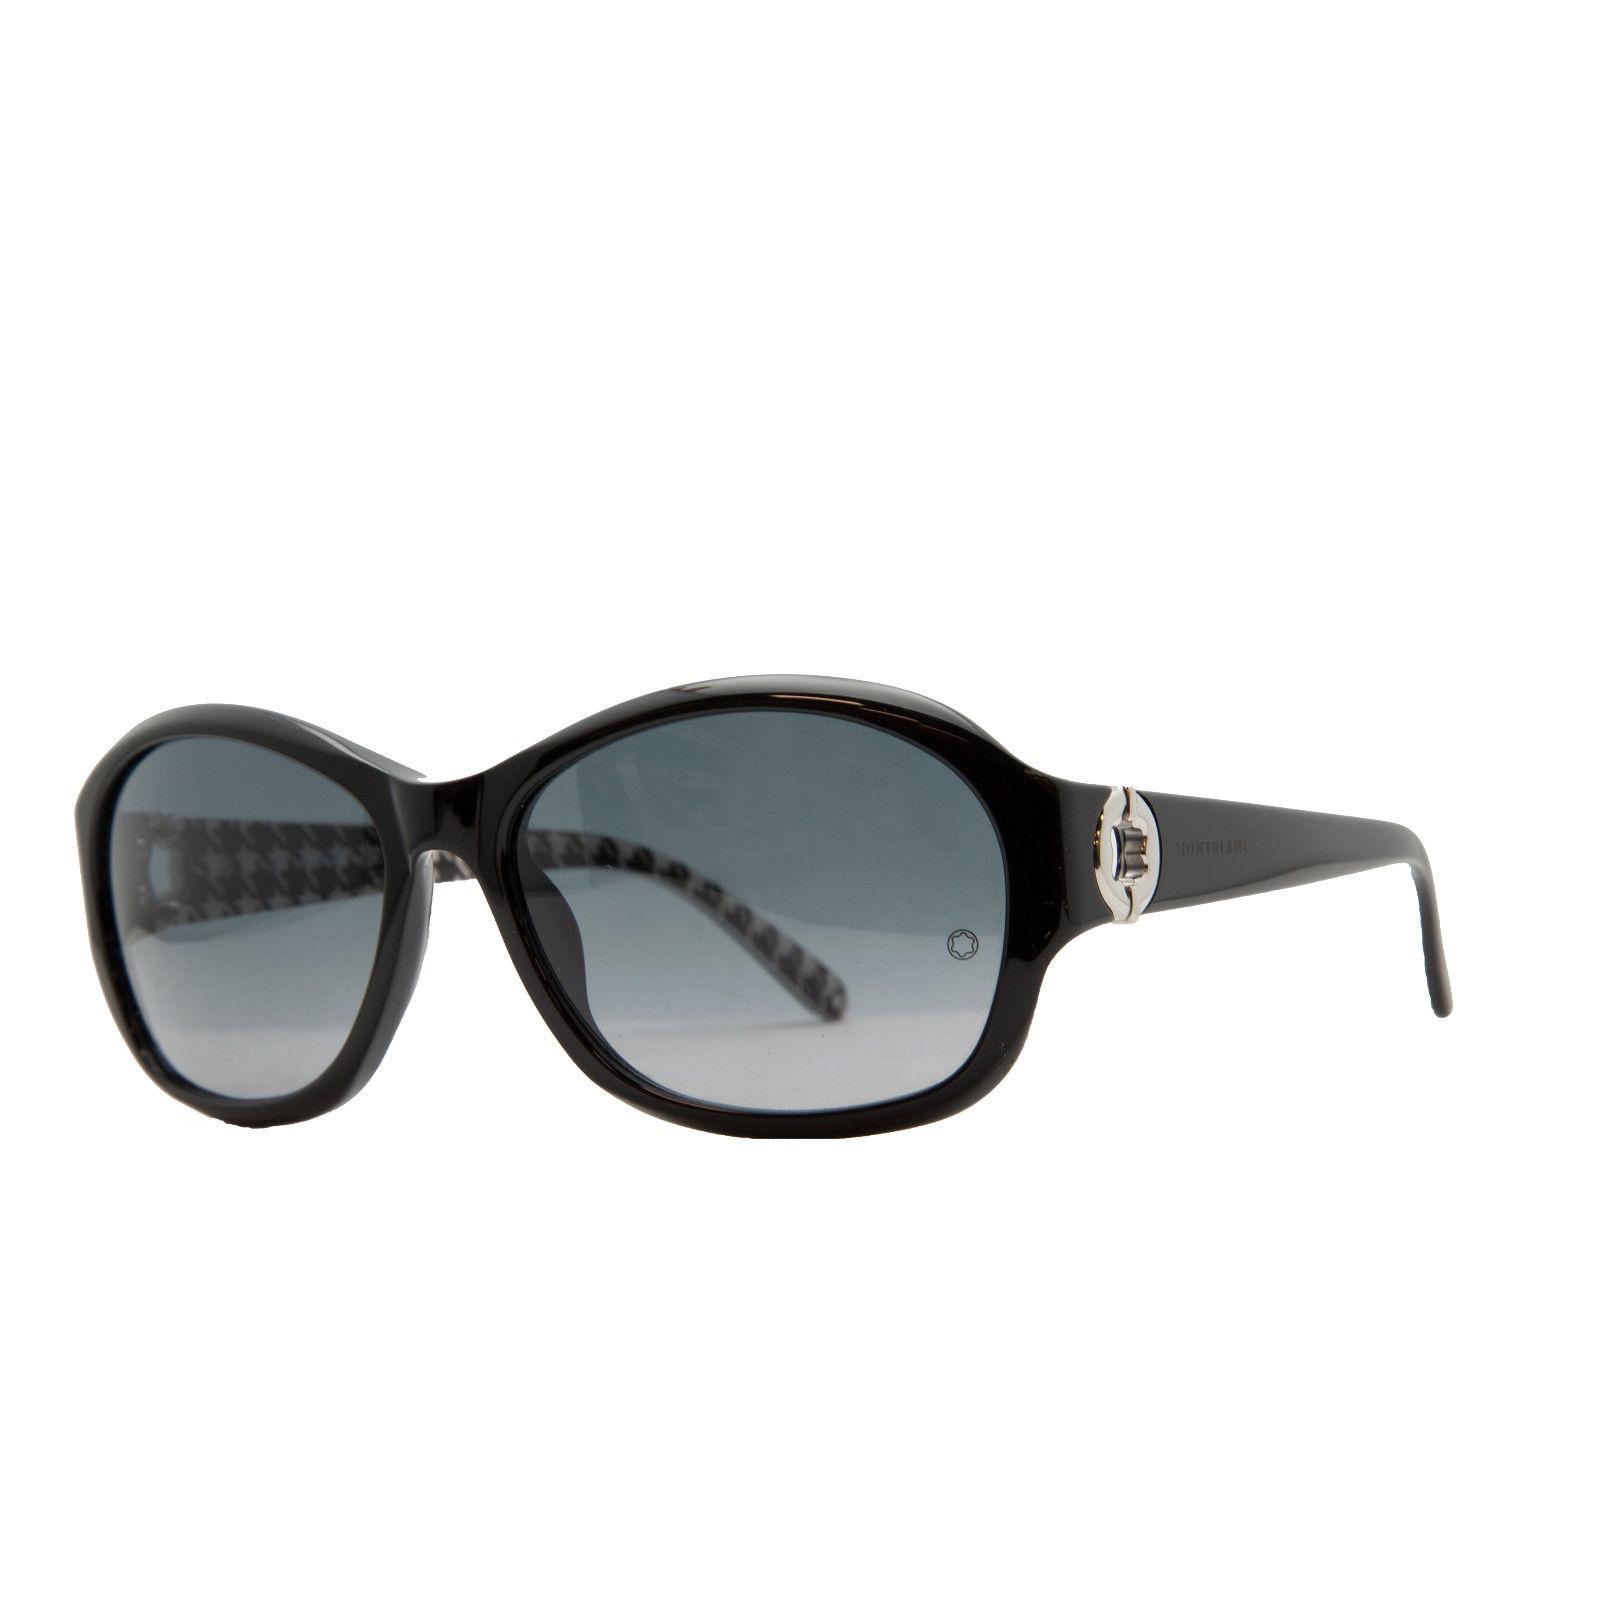 Mont Blanc MB 357/S 01B Black Oval Sunglasses